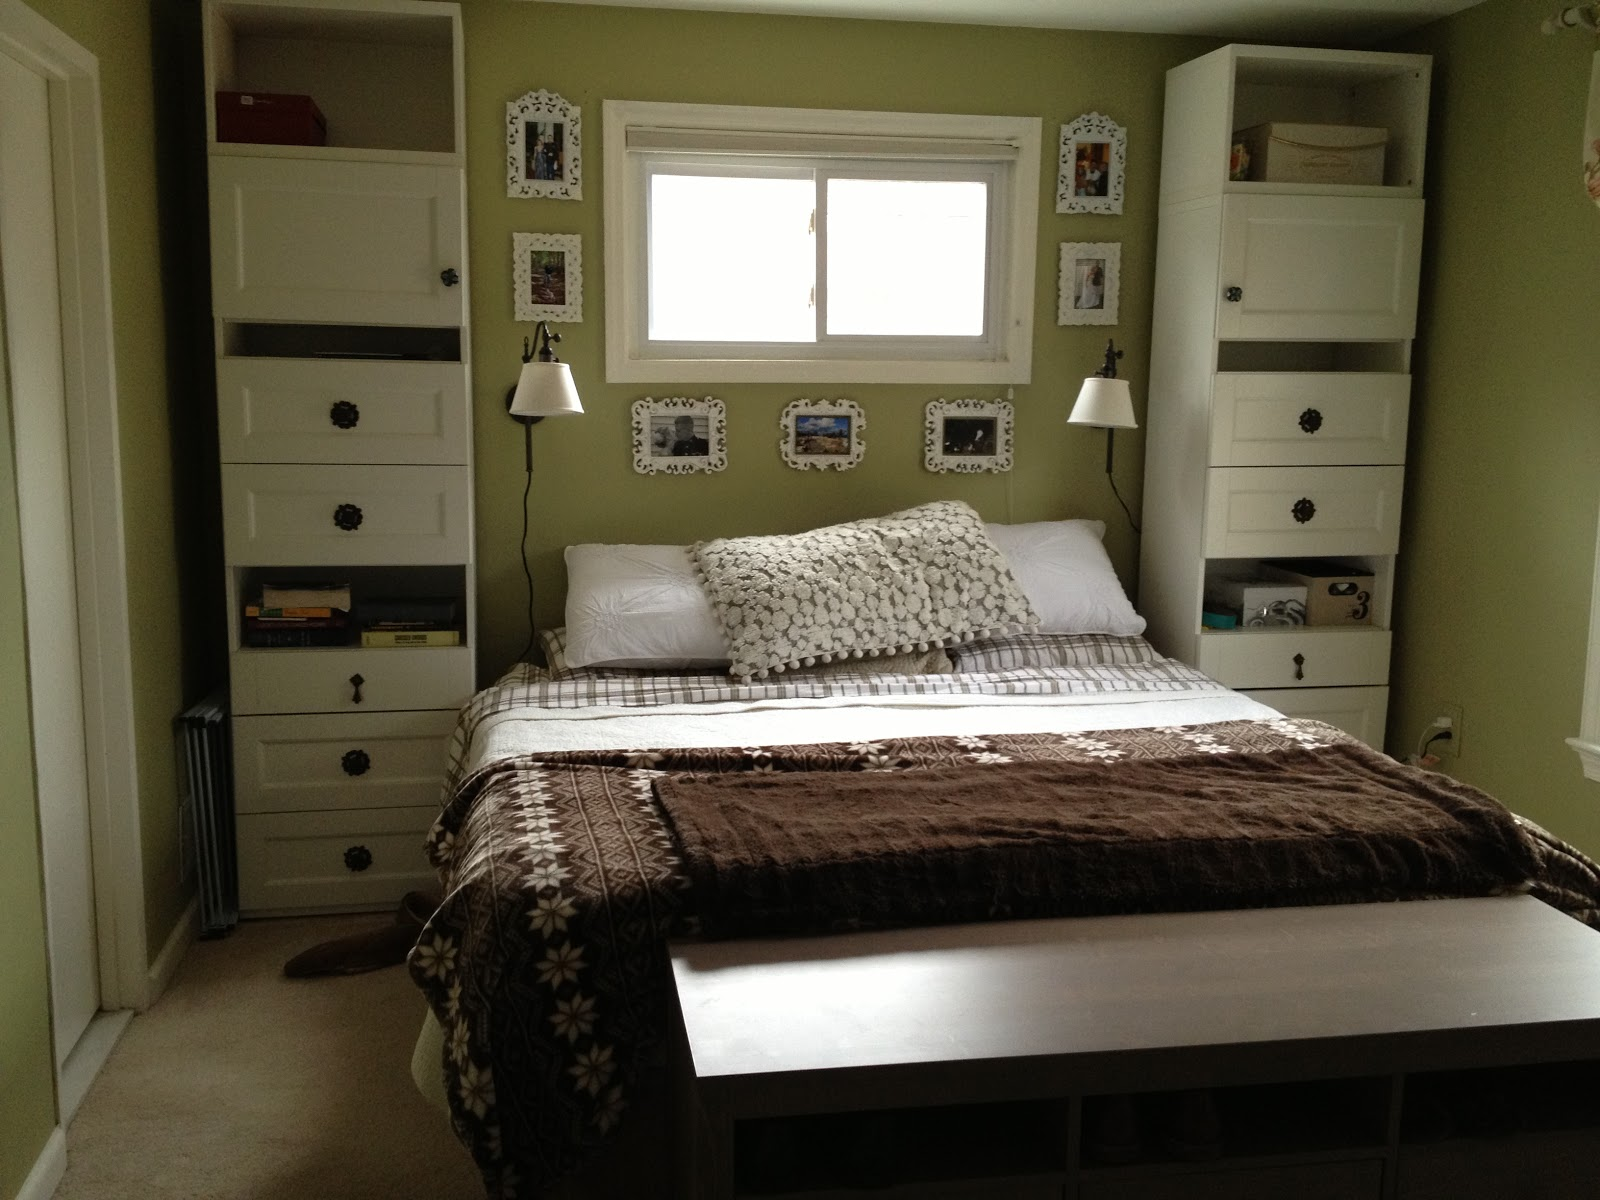 Chez Dufresne Master Bedroom Makeover